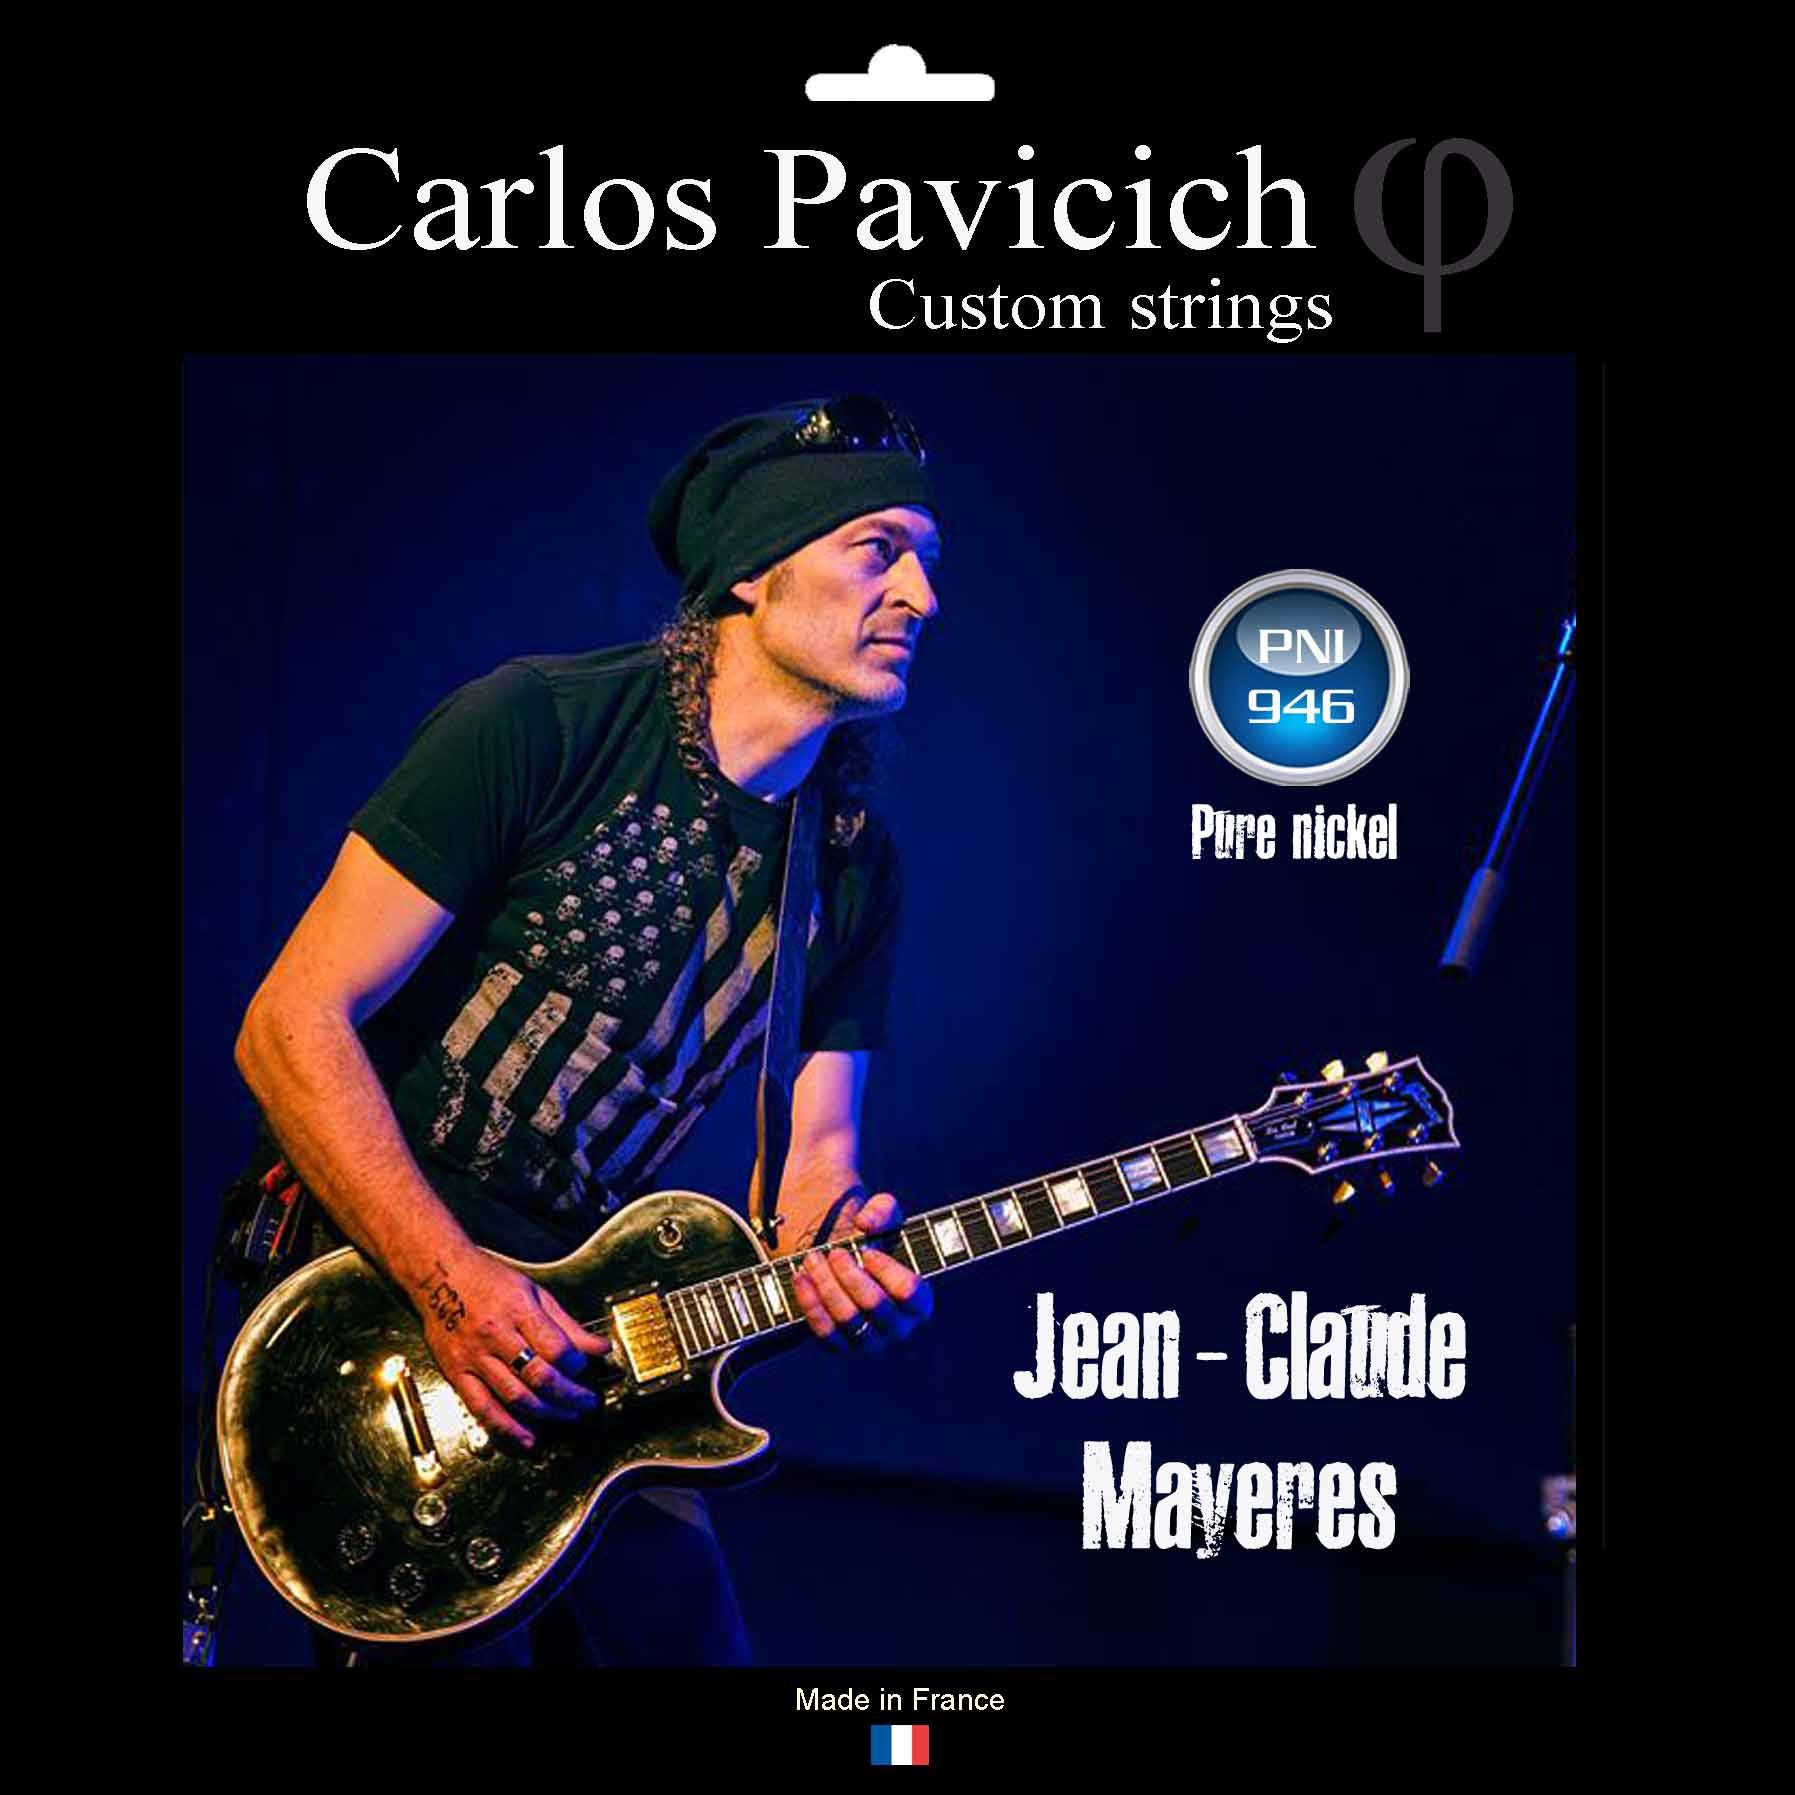 Jean-Claude Mayeres